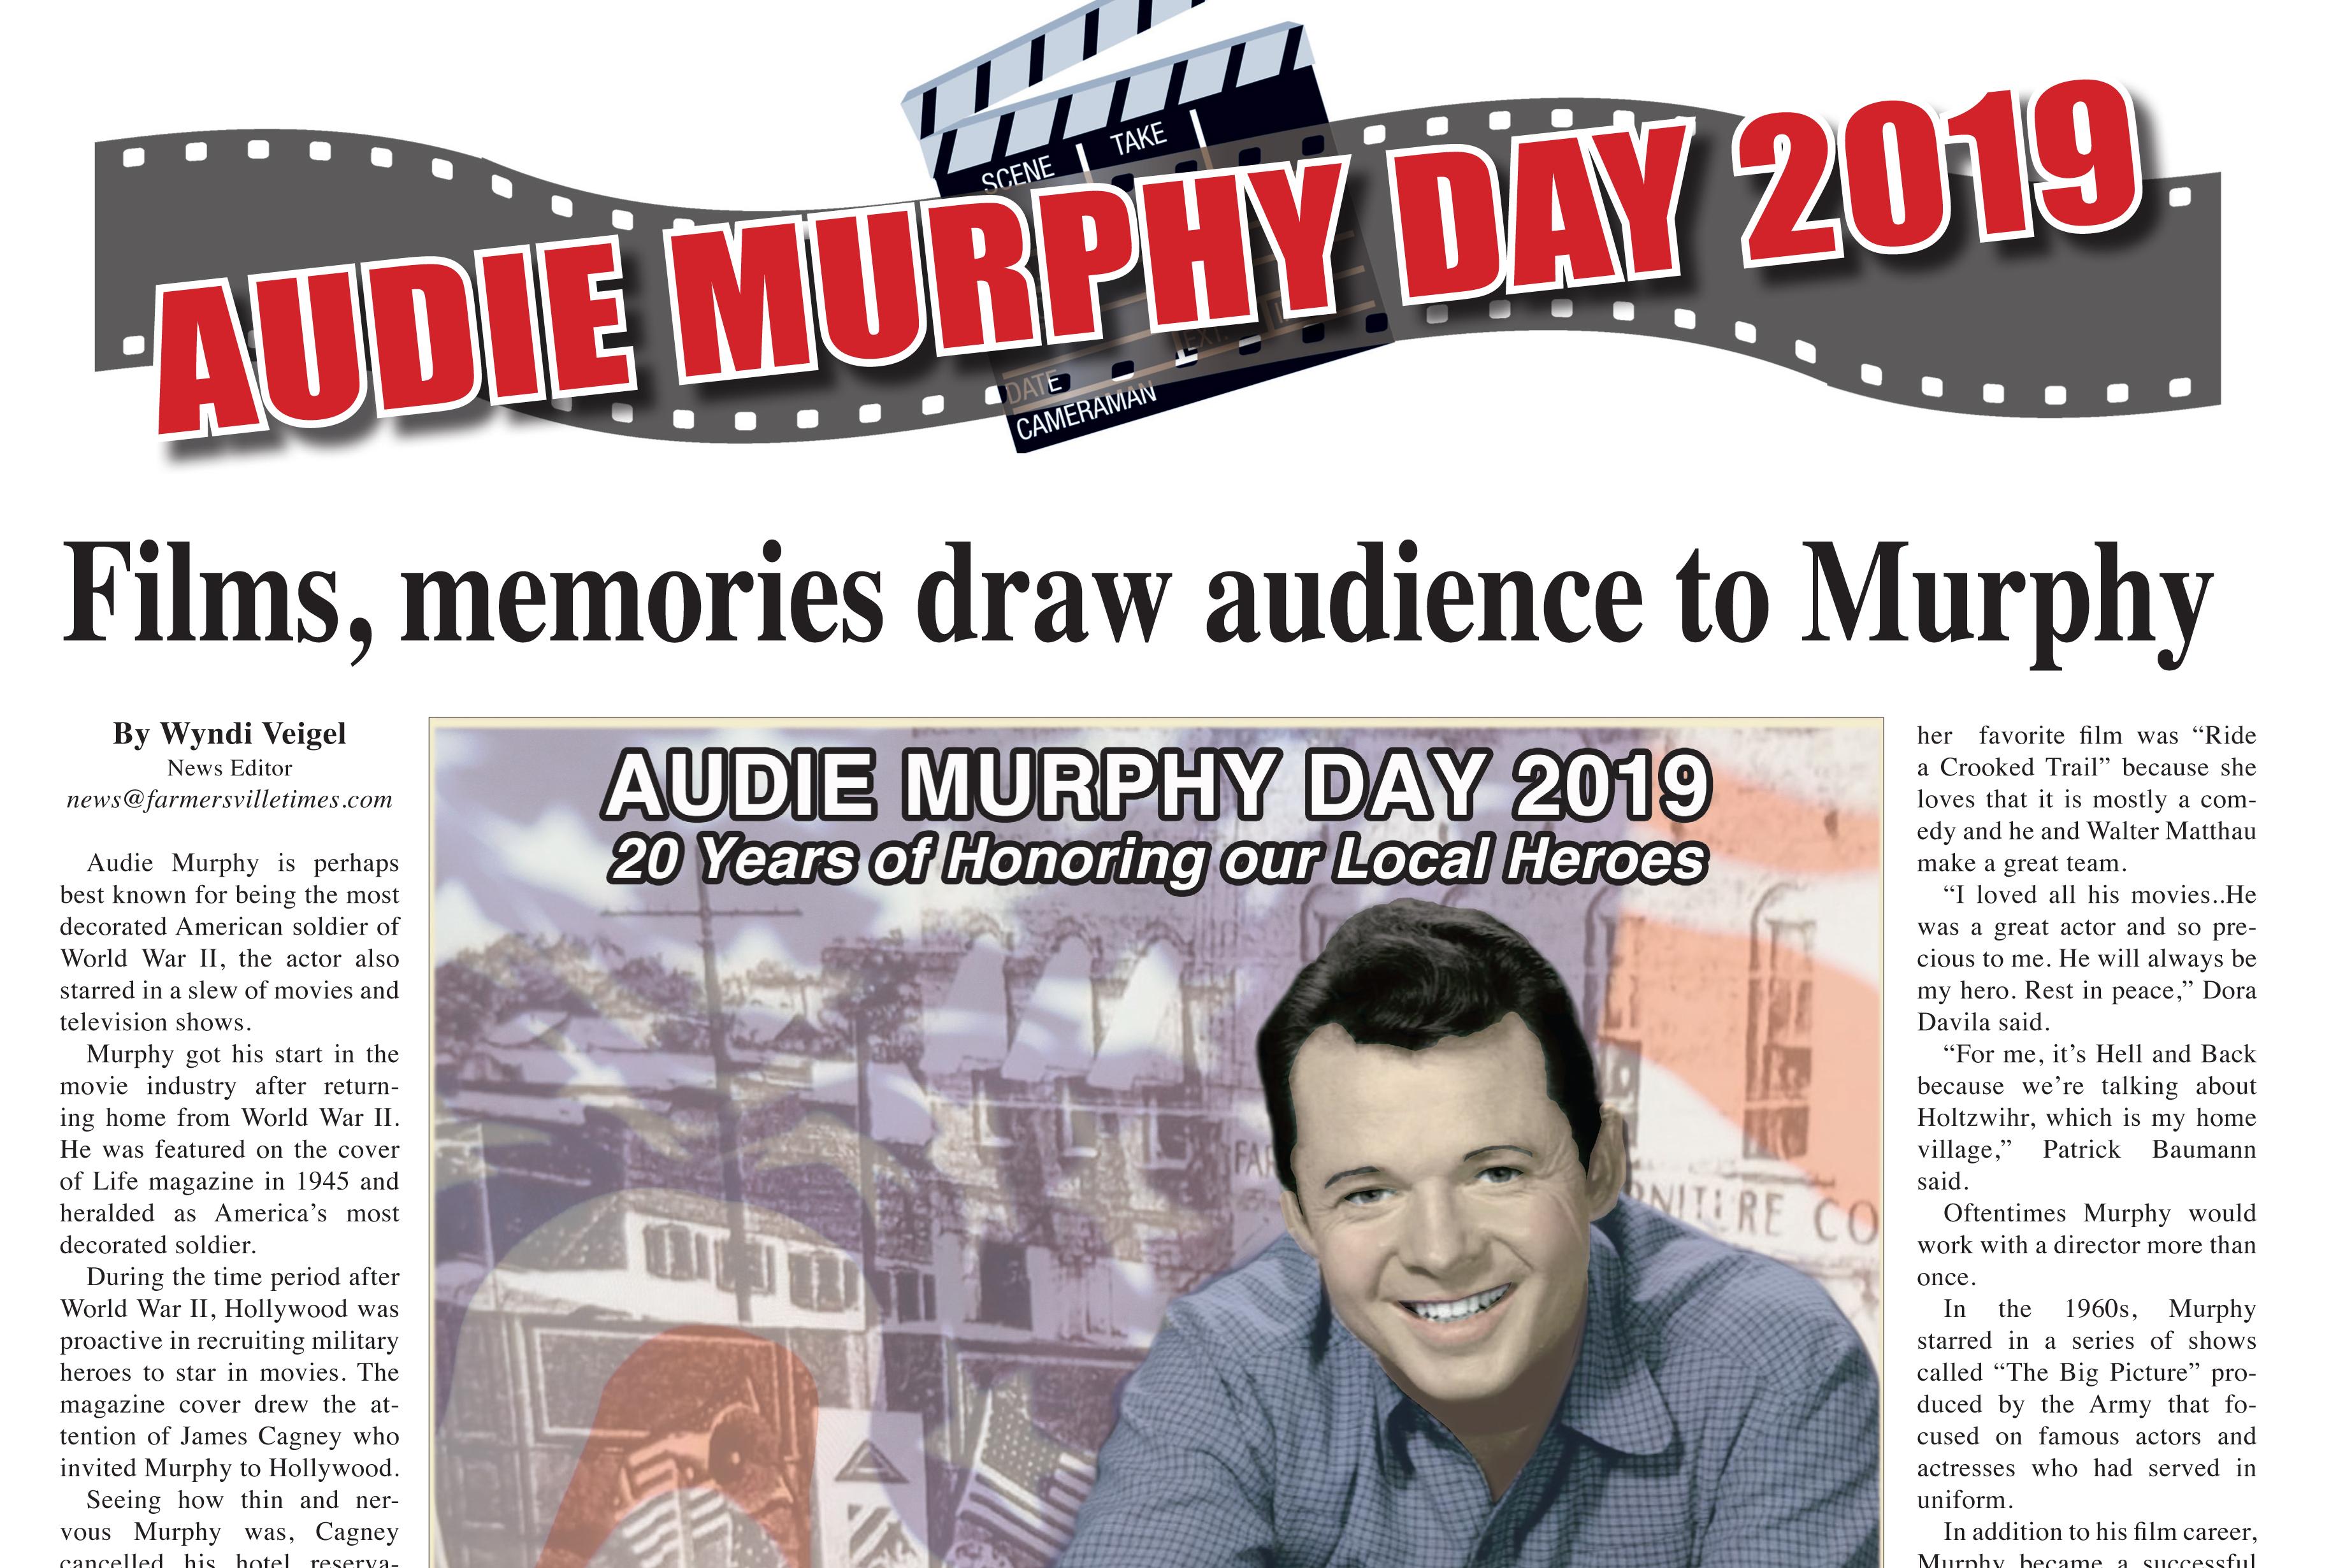 Films, memories draw audience to Murphy